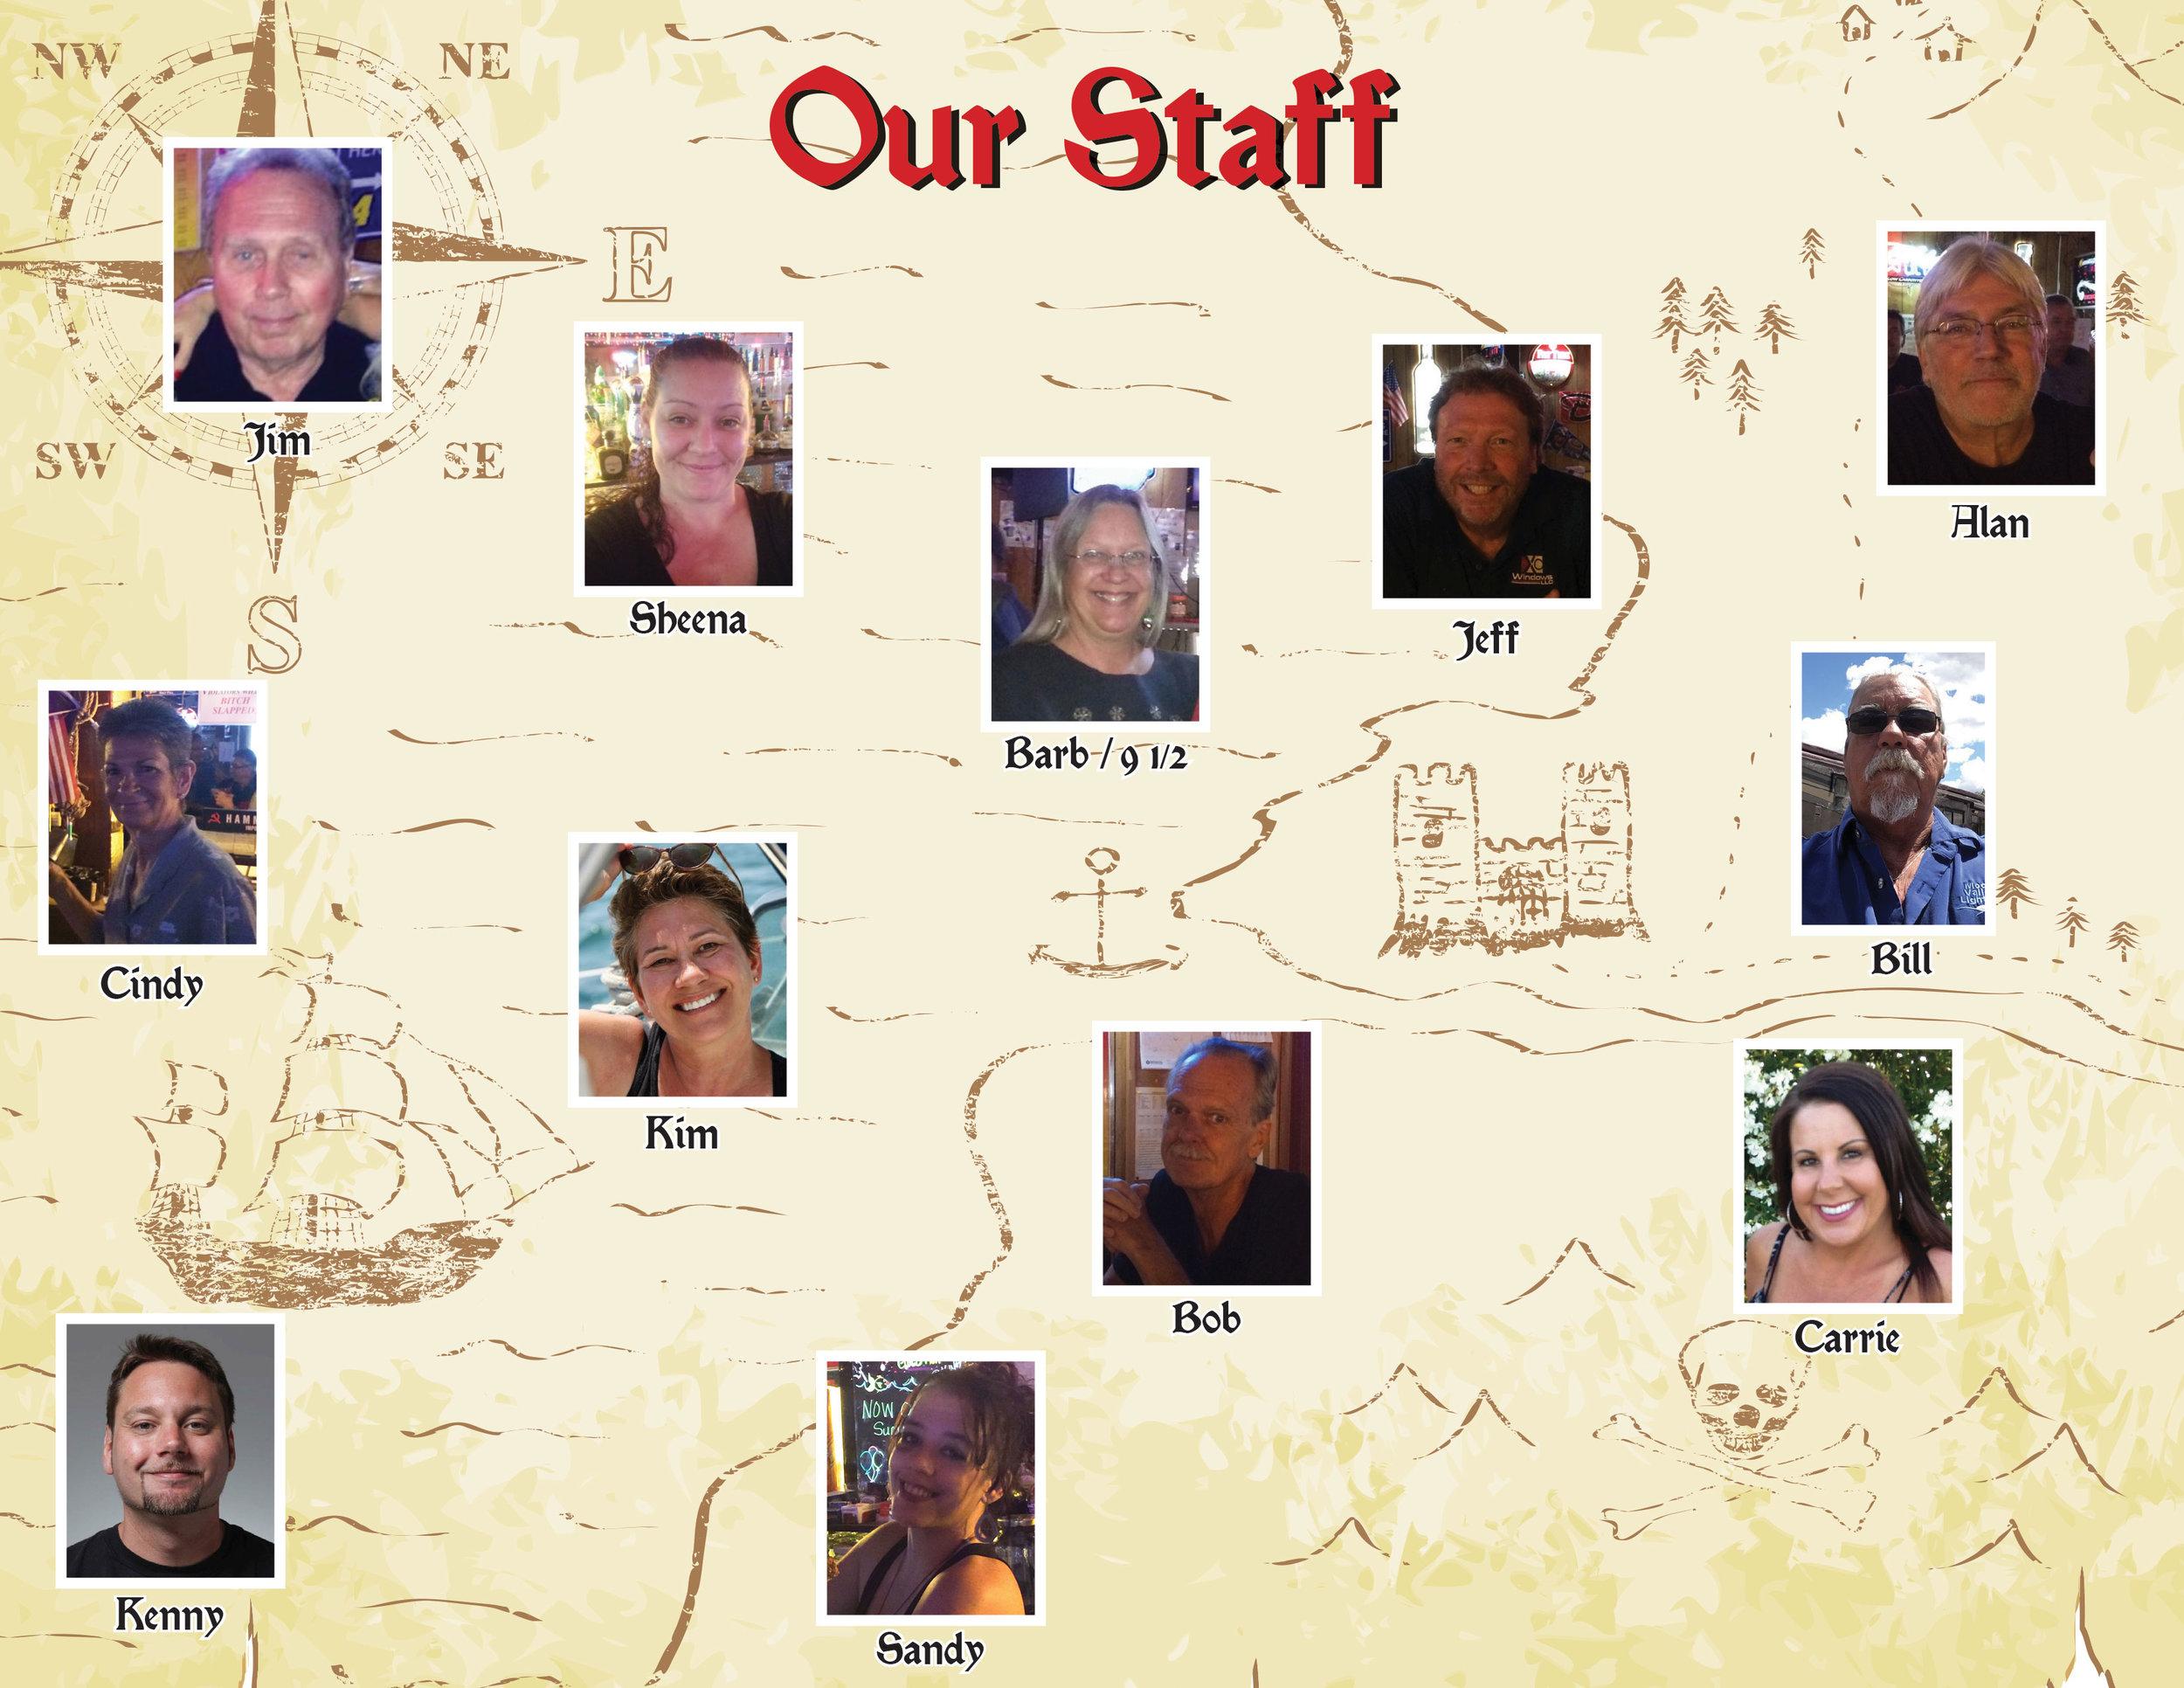 staff-photos-layout-6-17-19-web.jpg